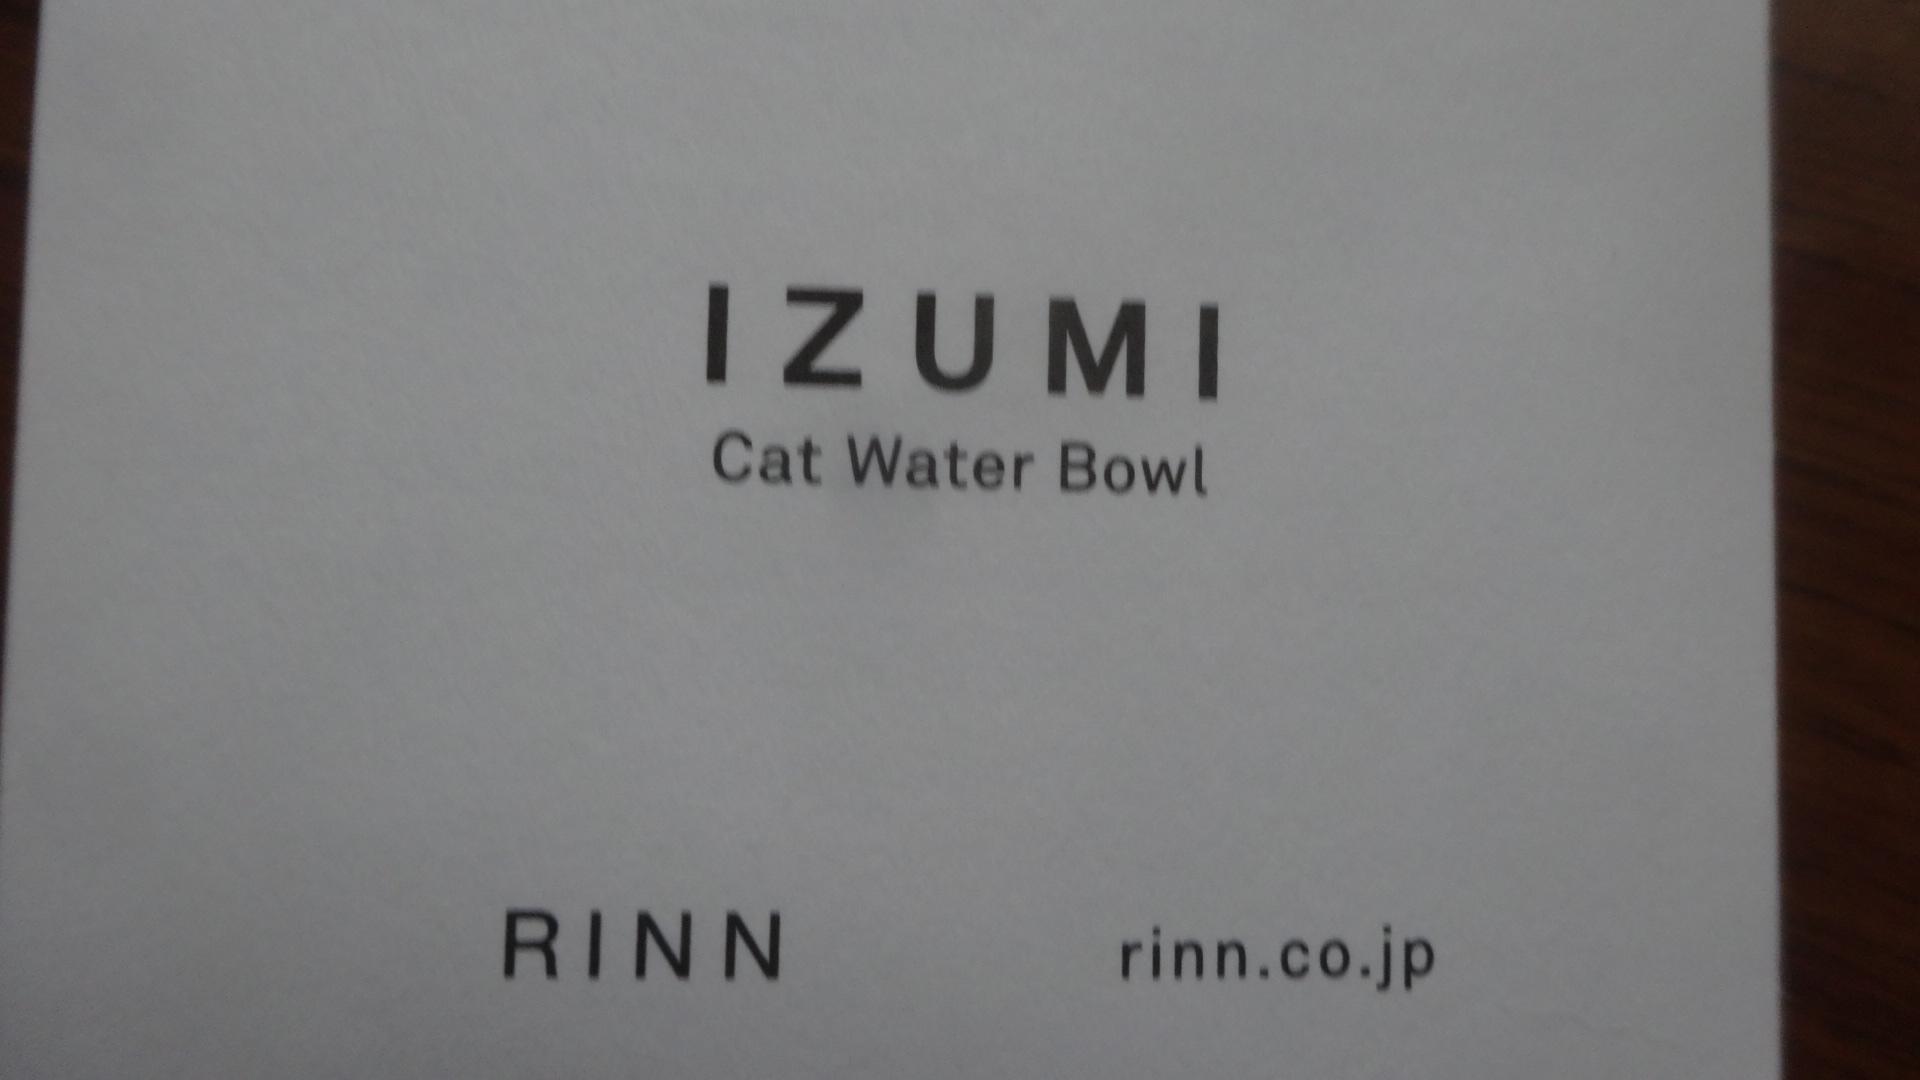 IZUMIと書かれたカード